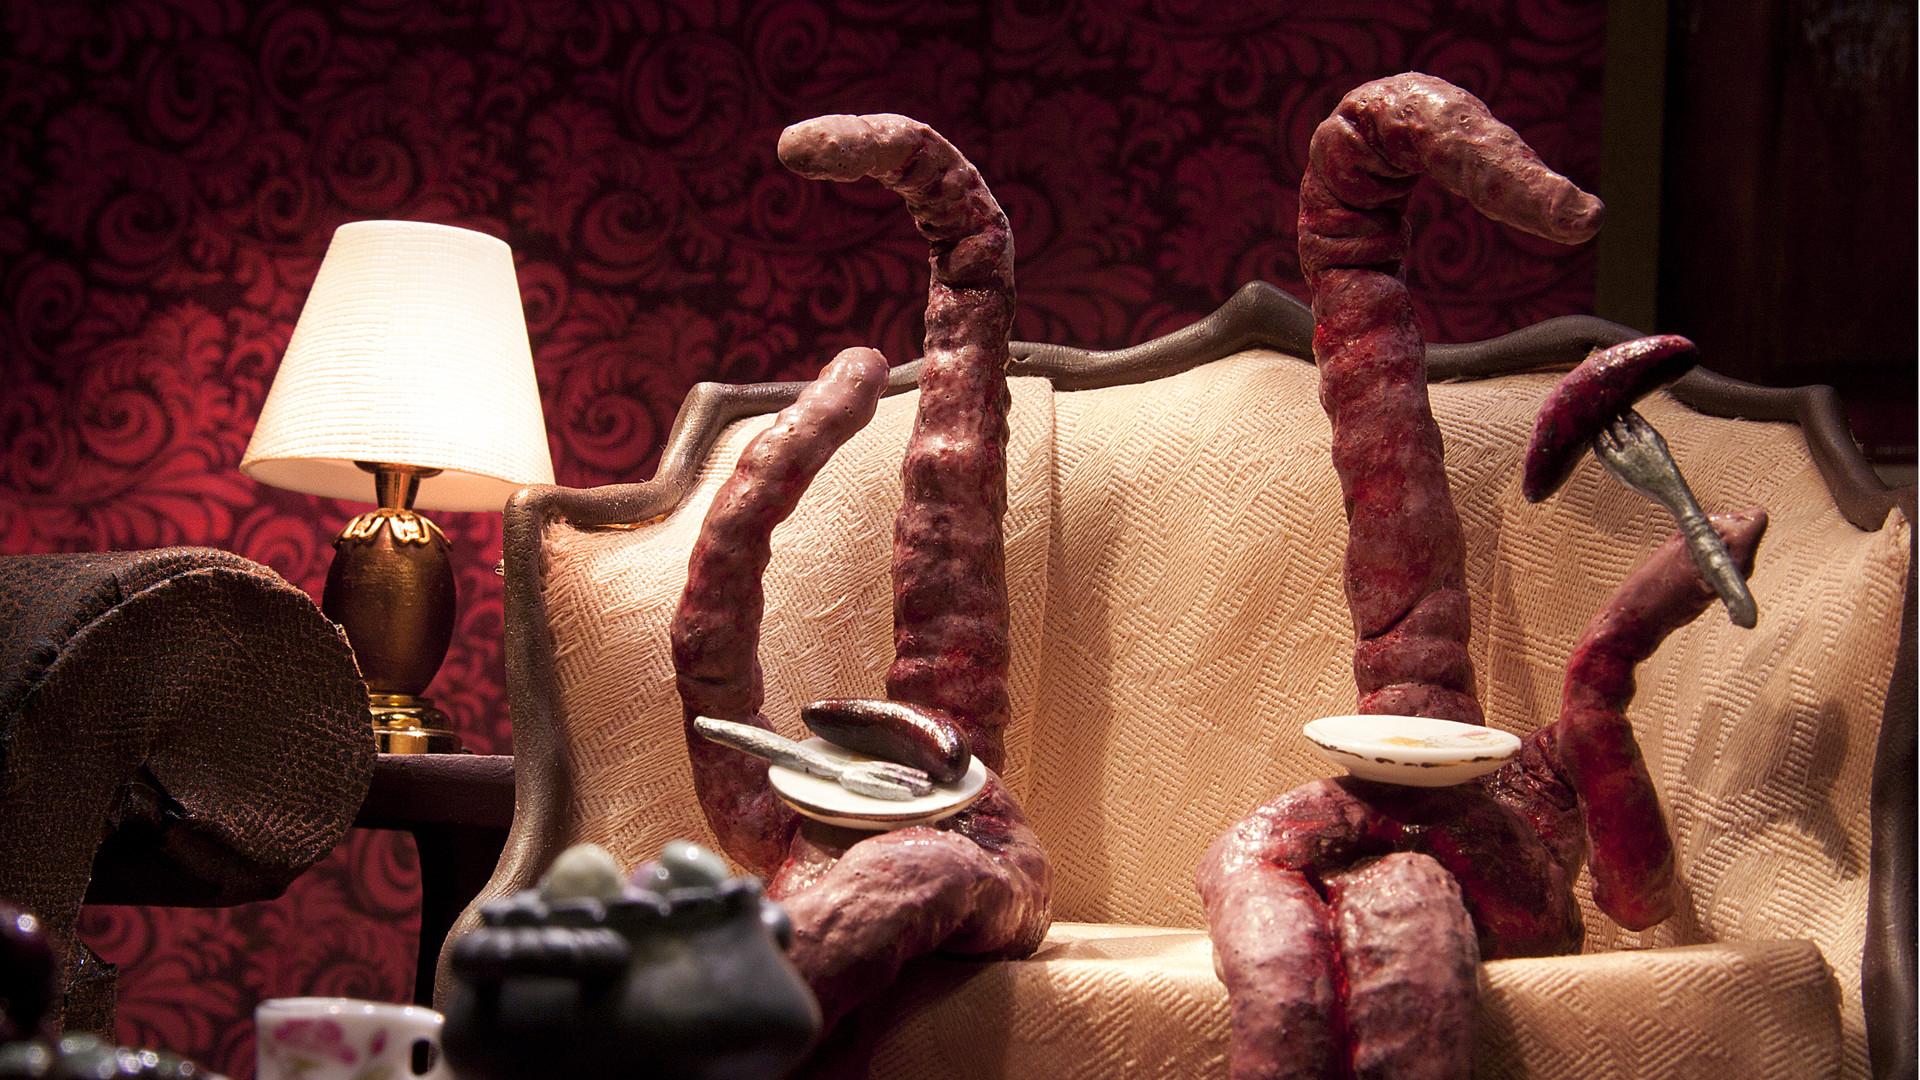 Lauren morrison tentacles close